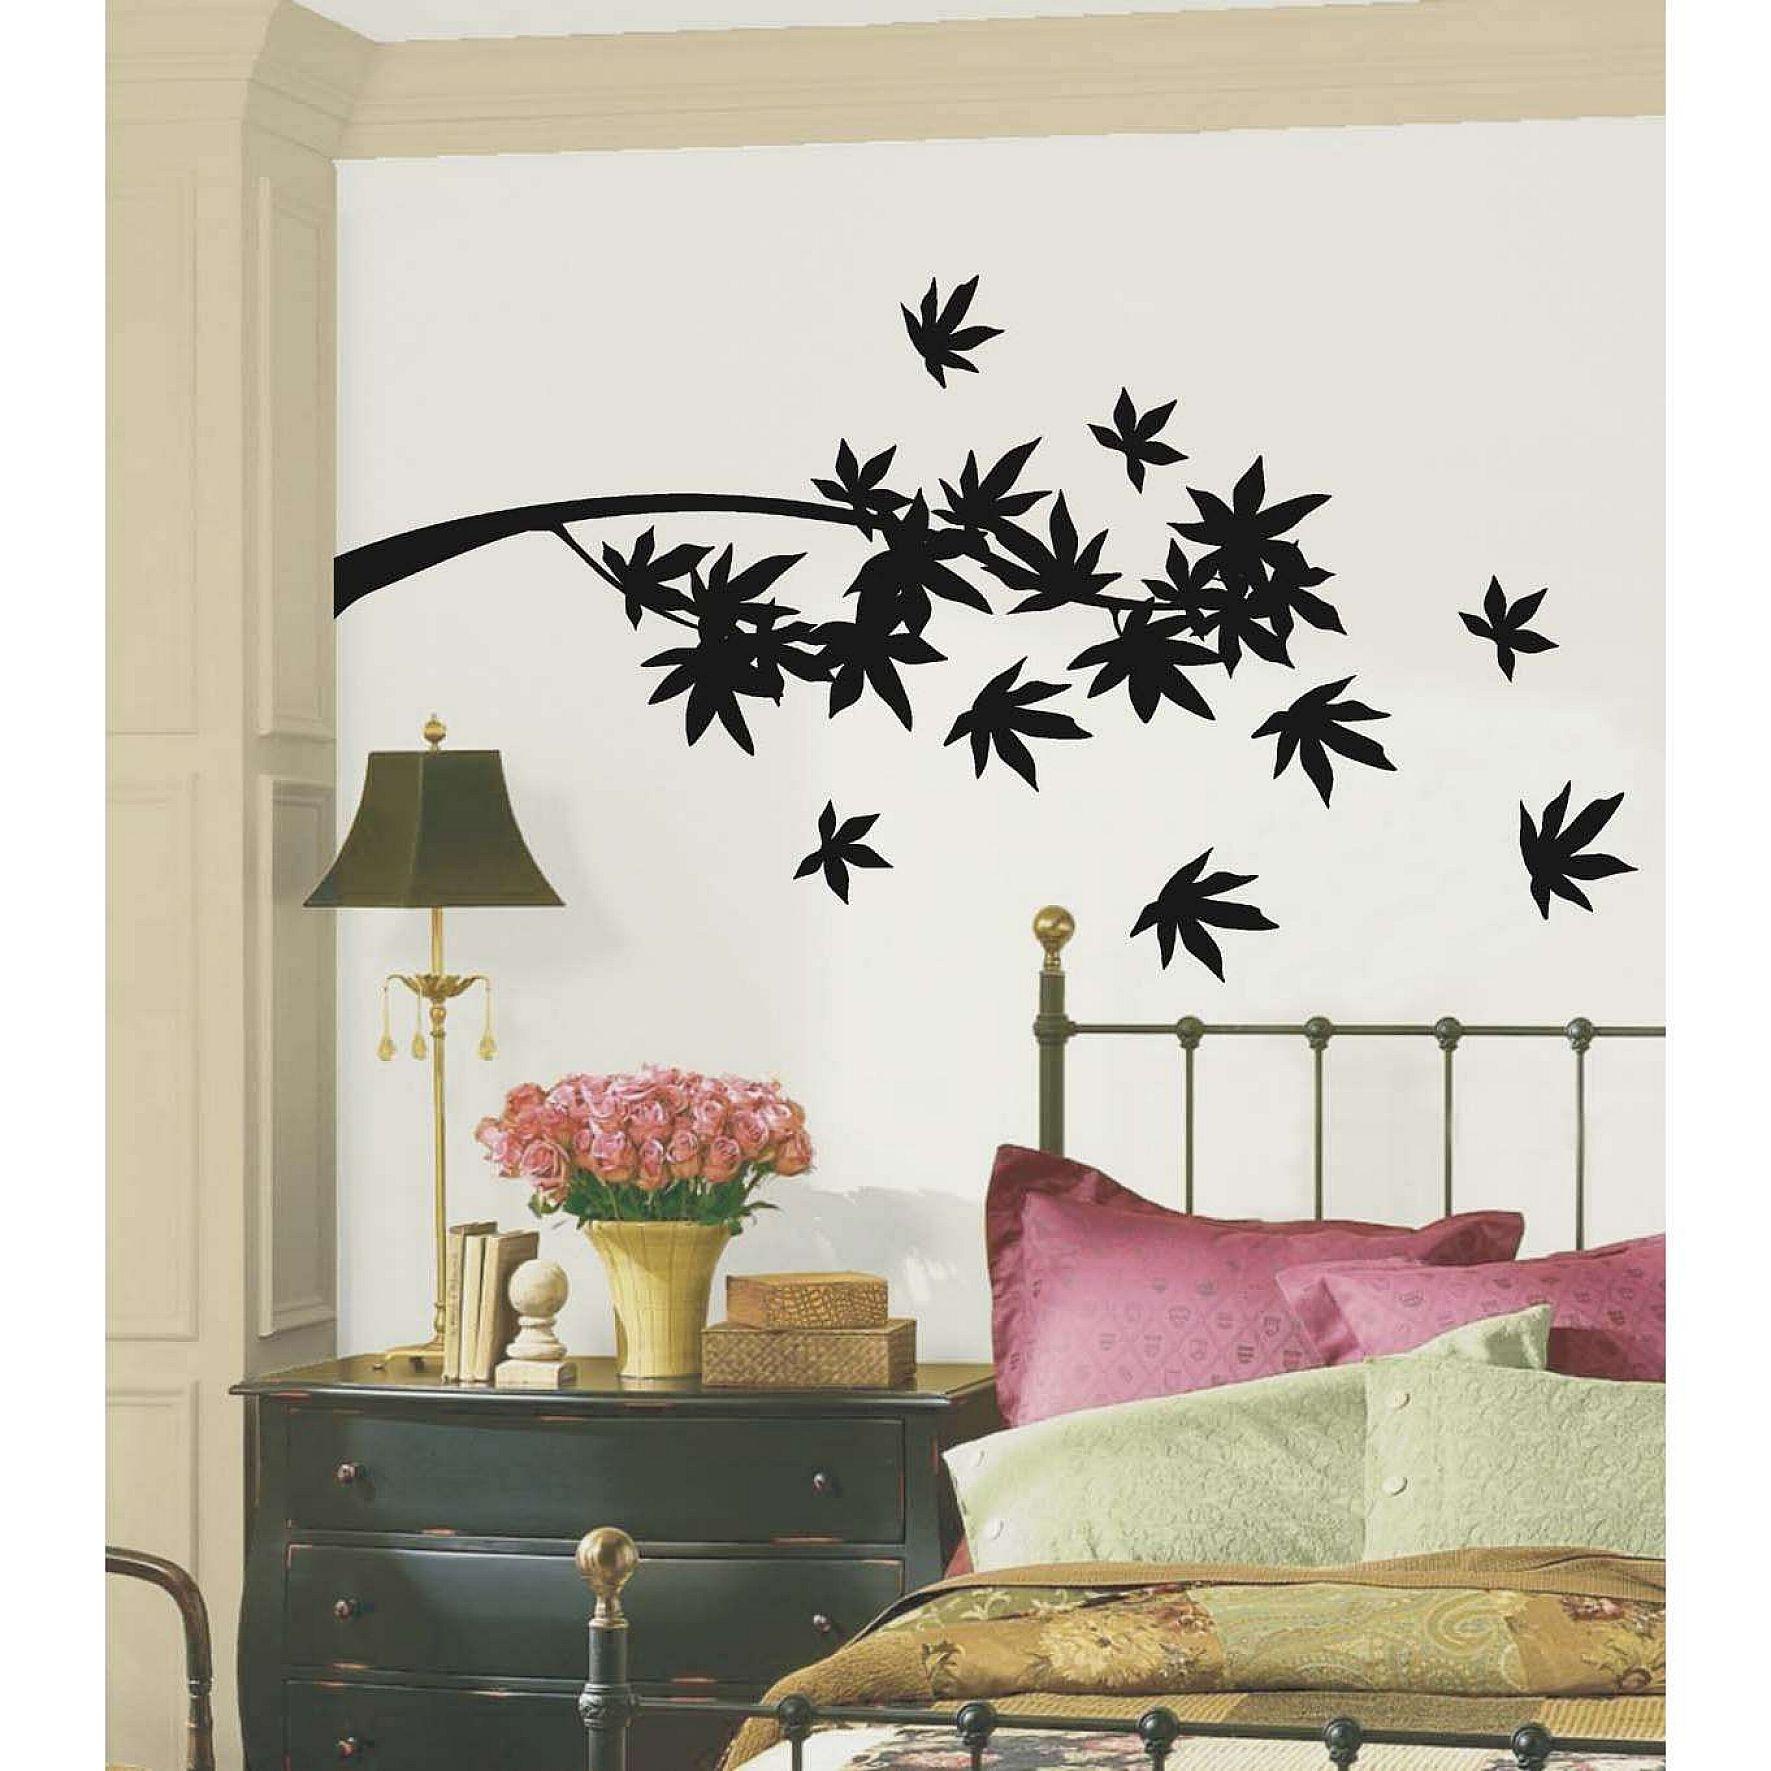 design of bedroom walls amazing designs for walls 1 1